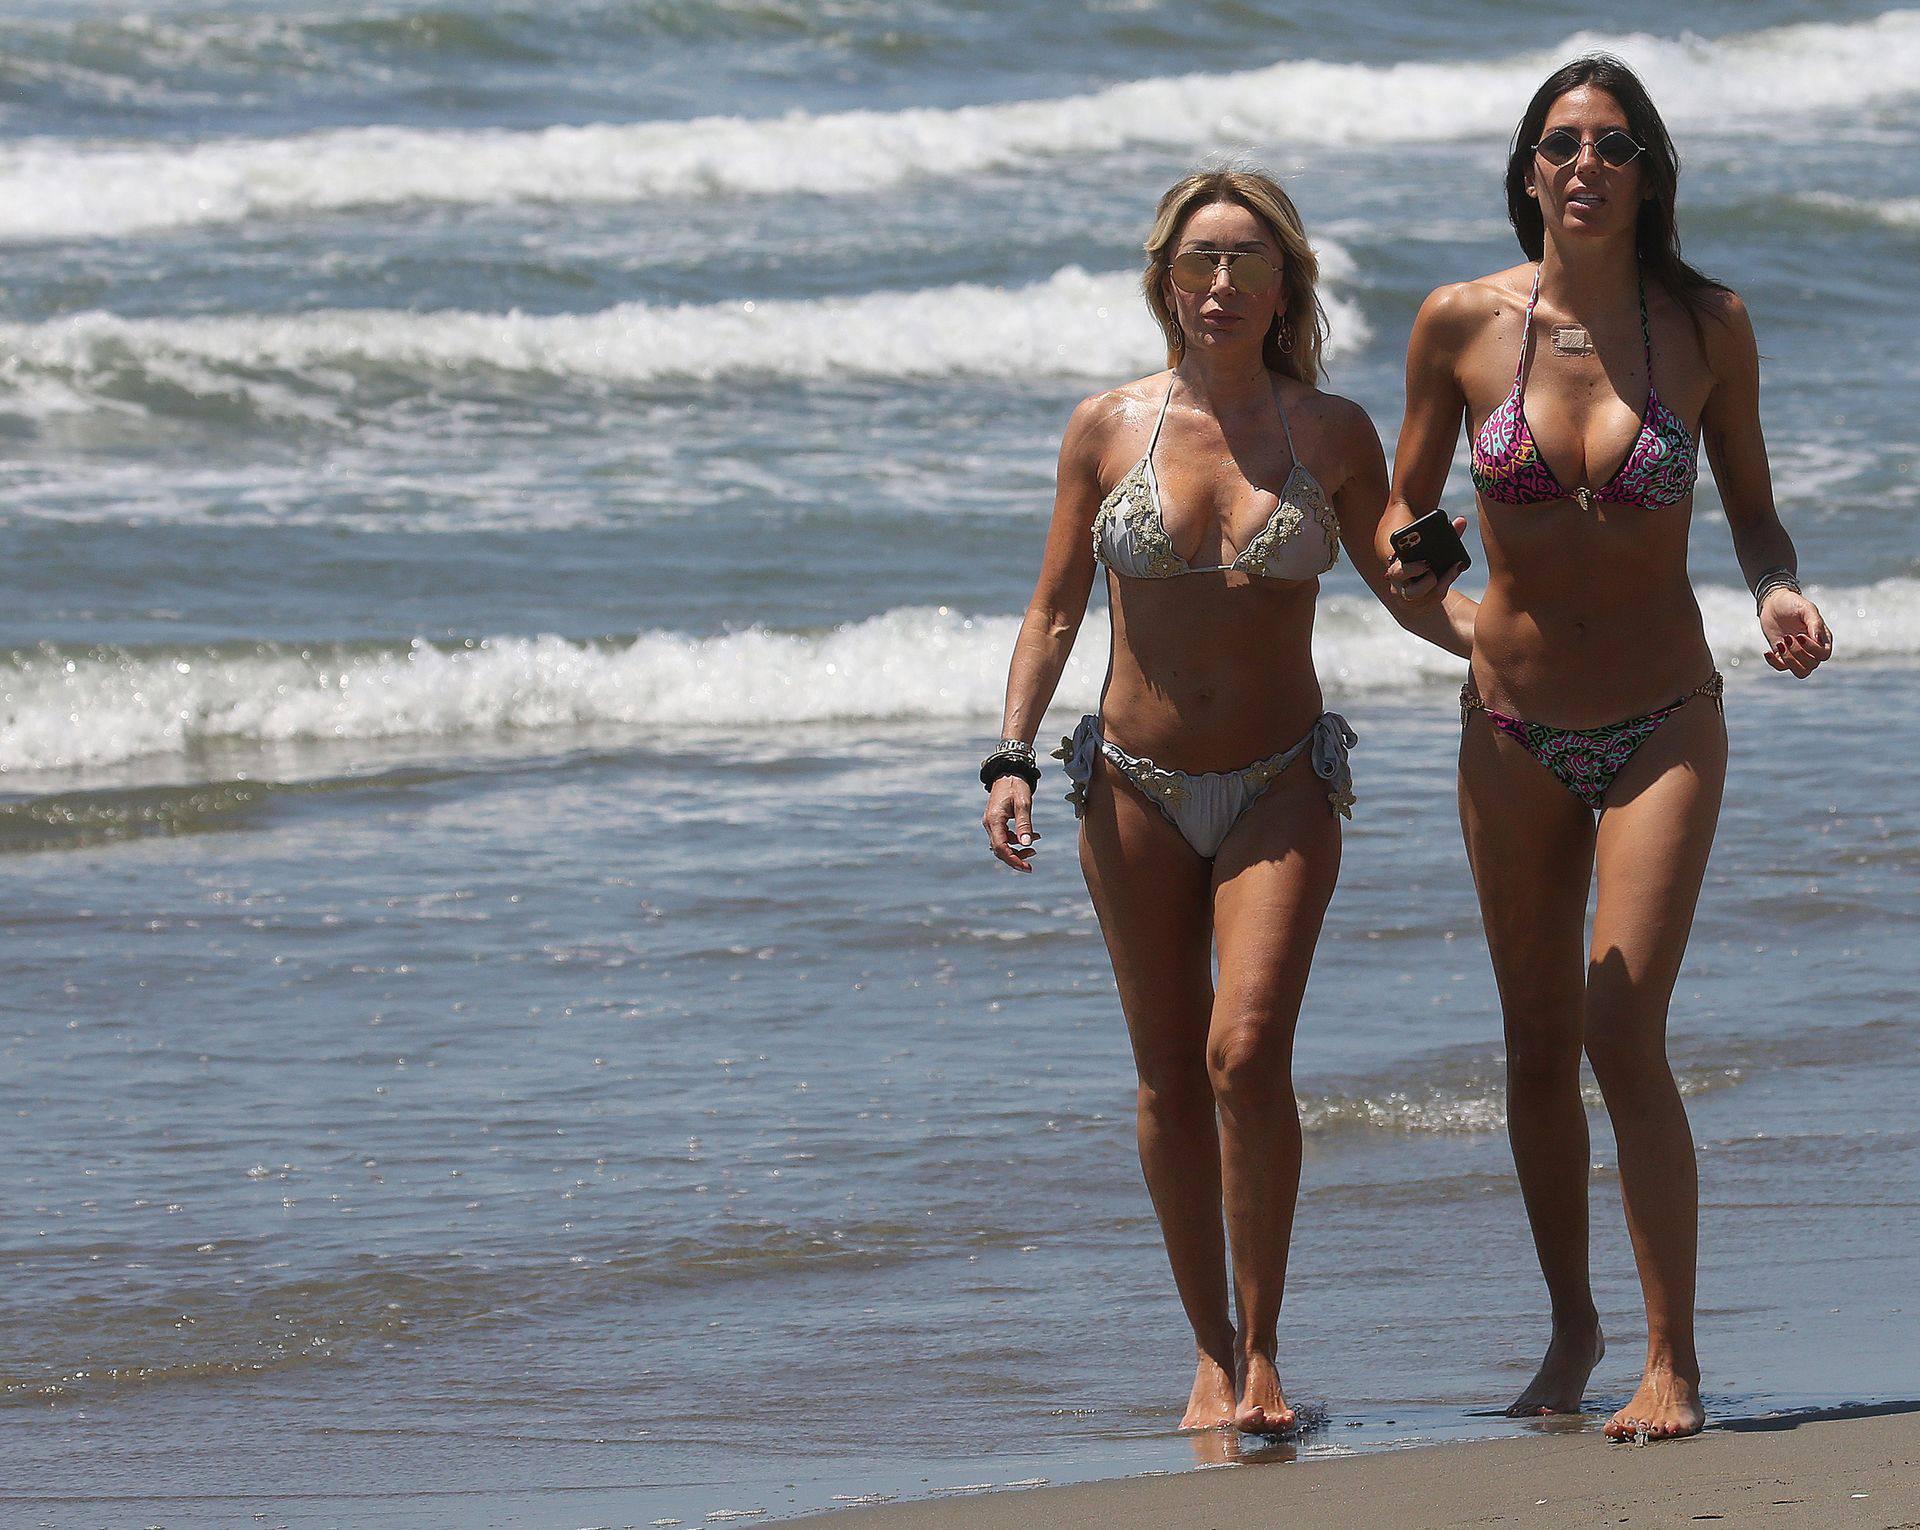 Elisabetta Gregoraci – Sexy Boobs And Ass In A Bikini At The Beach In Miami Beach 0013